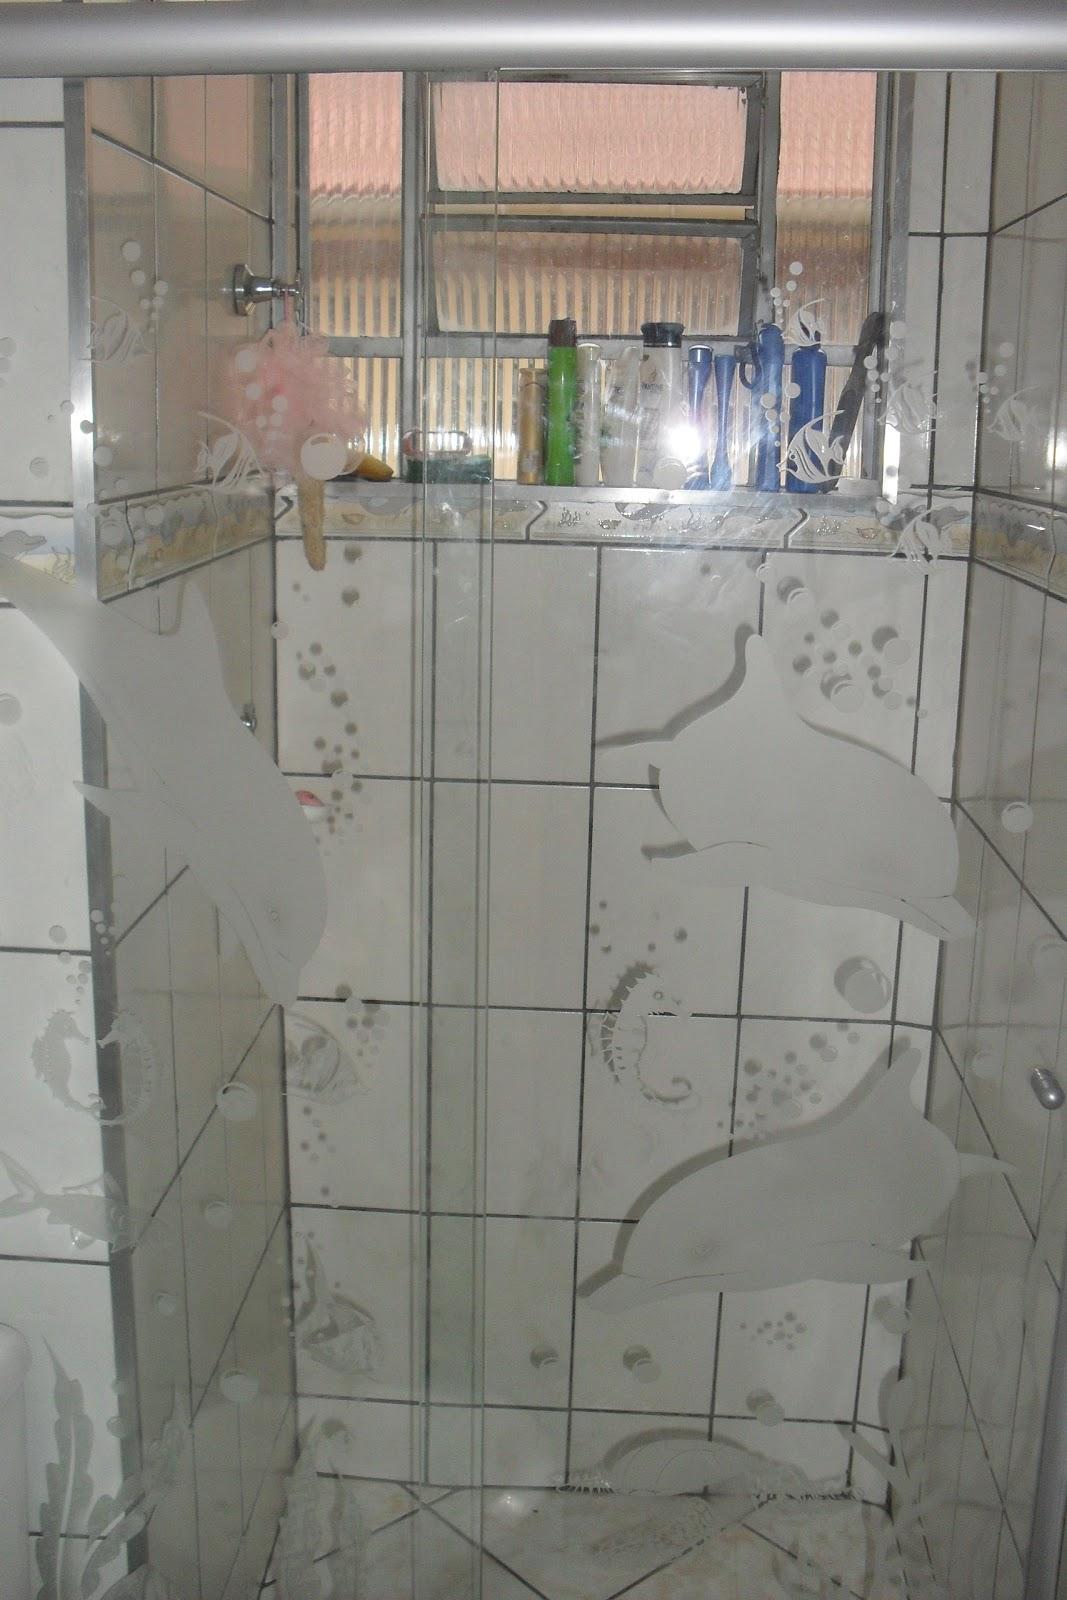 Adesivos Para Vidros Box Vidro Personalizados Tattoos #815E4A 1067x1600 Adesivo Blindex Banheiro